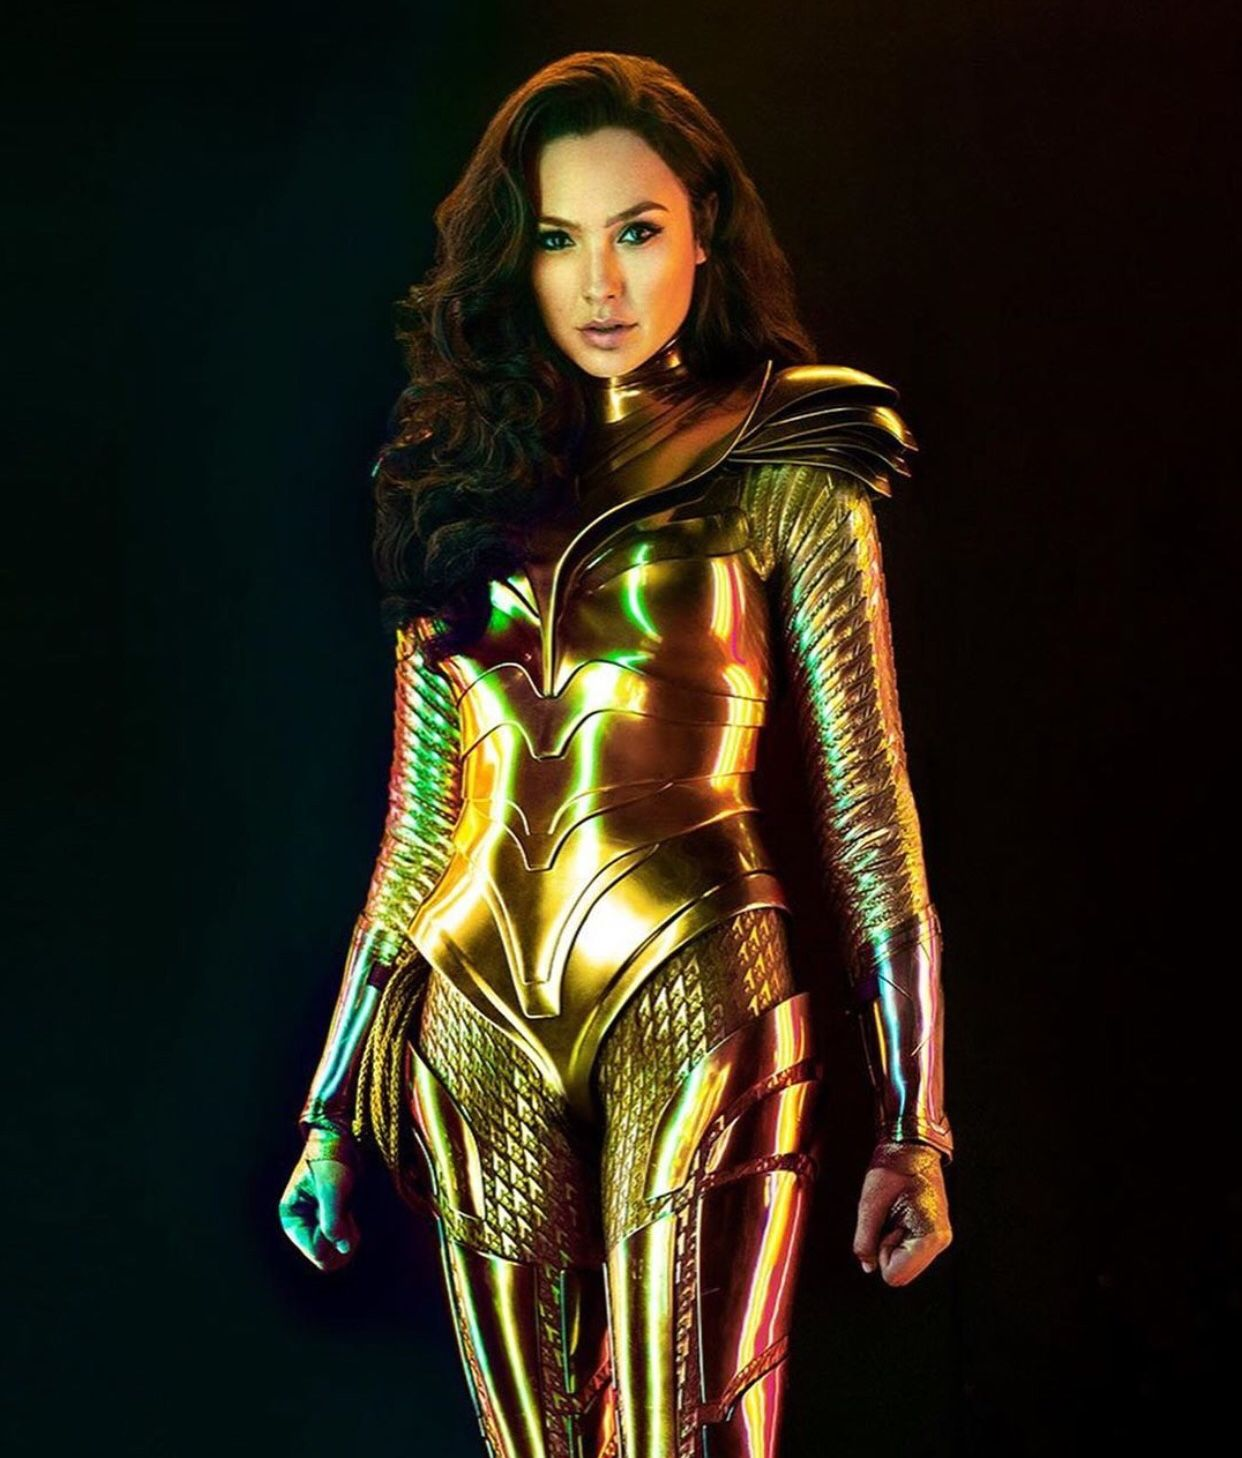 Pin By Rick Grimes On Gal Gadot In 2020 Wonder Woman Wonder Woman Movie Gal Gadot